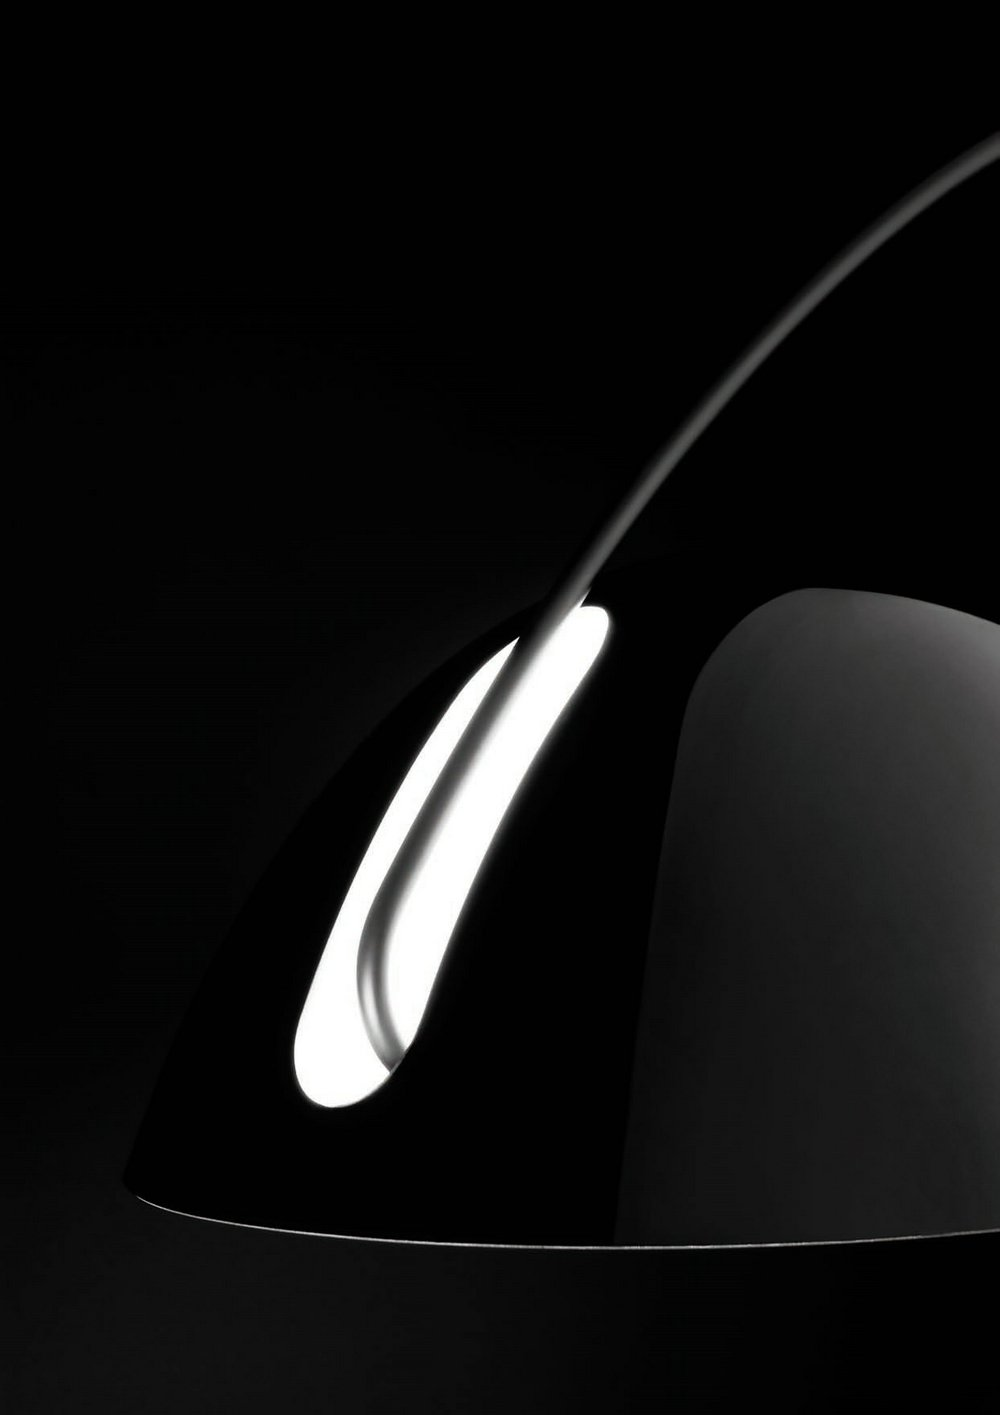 Pluma P 2959 lámpara de Pie con brazo extensible con dimmer E27 25w negro Estiluz Foto